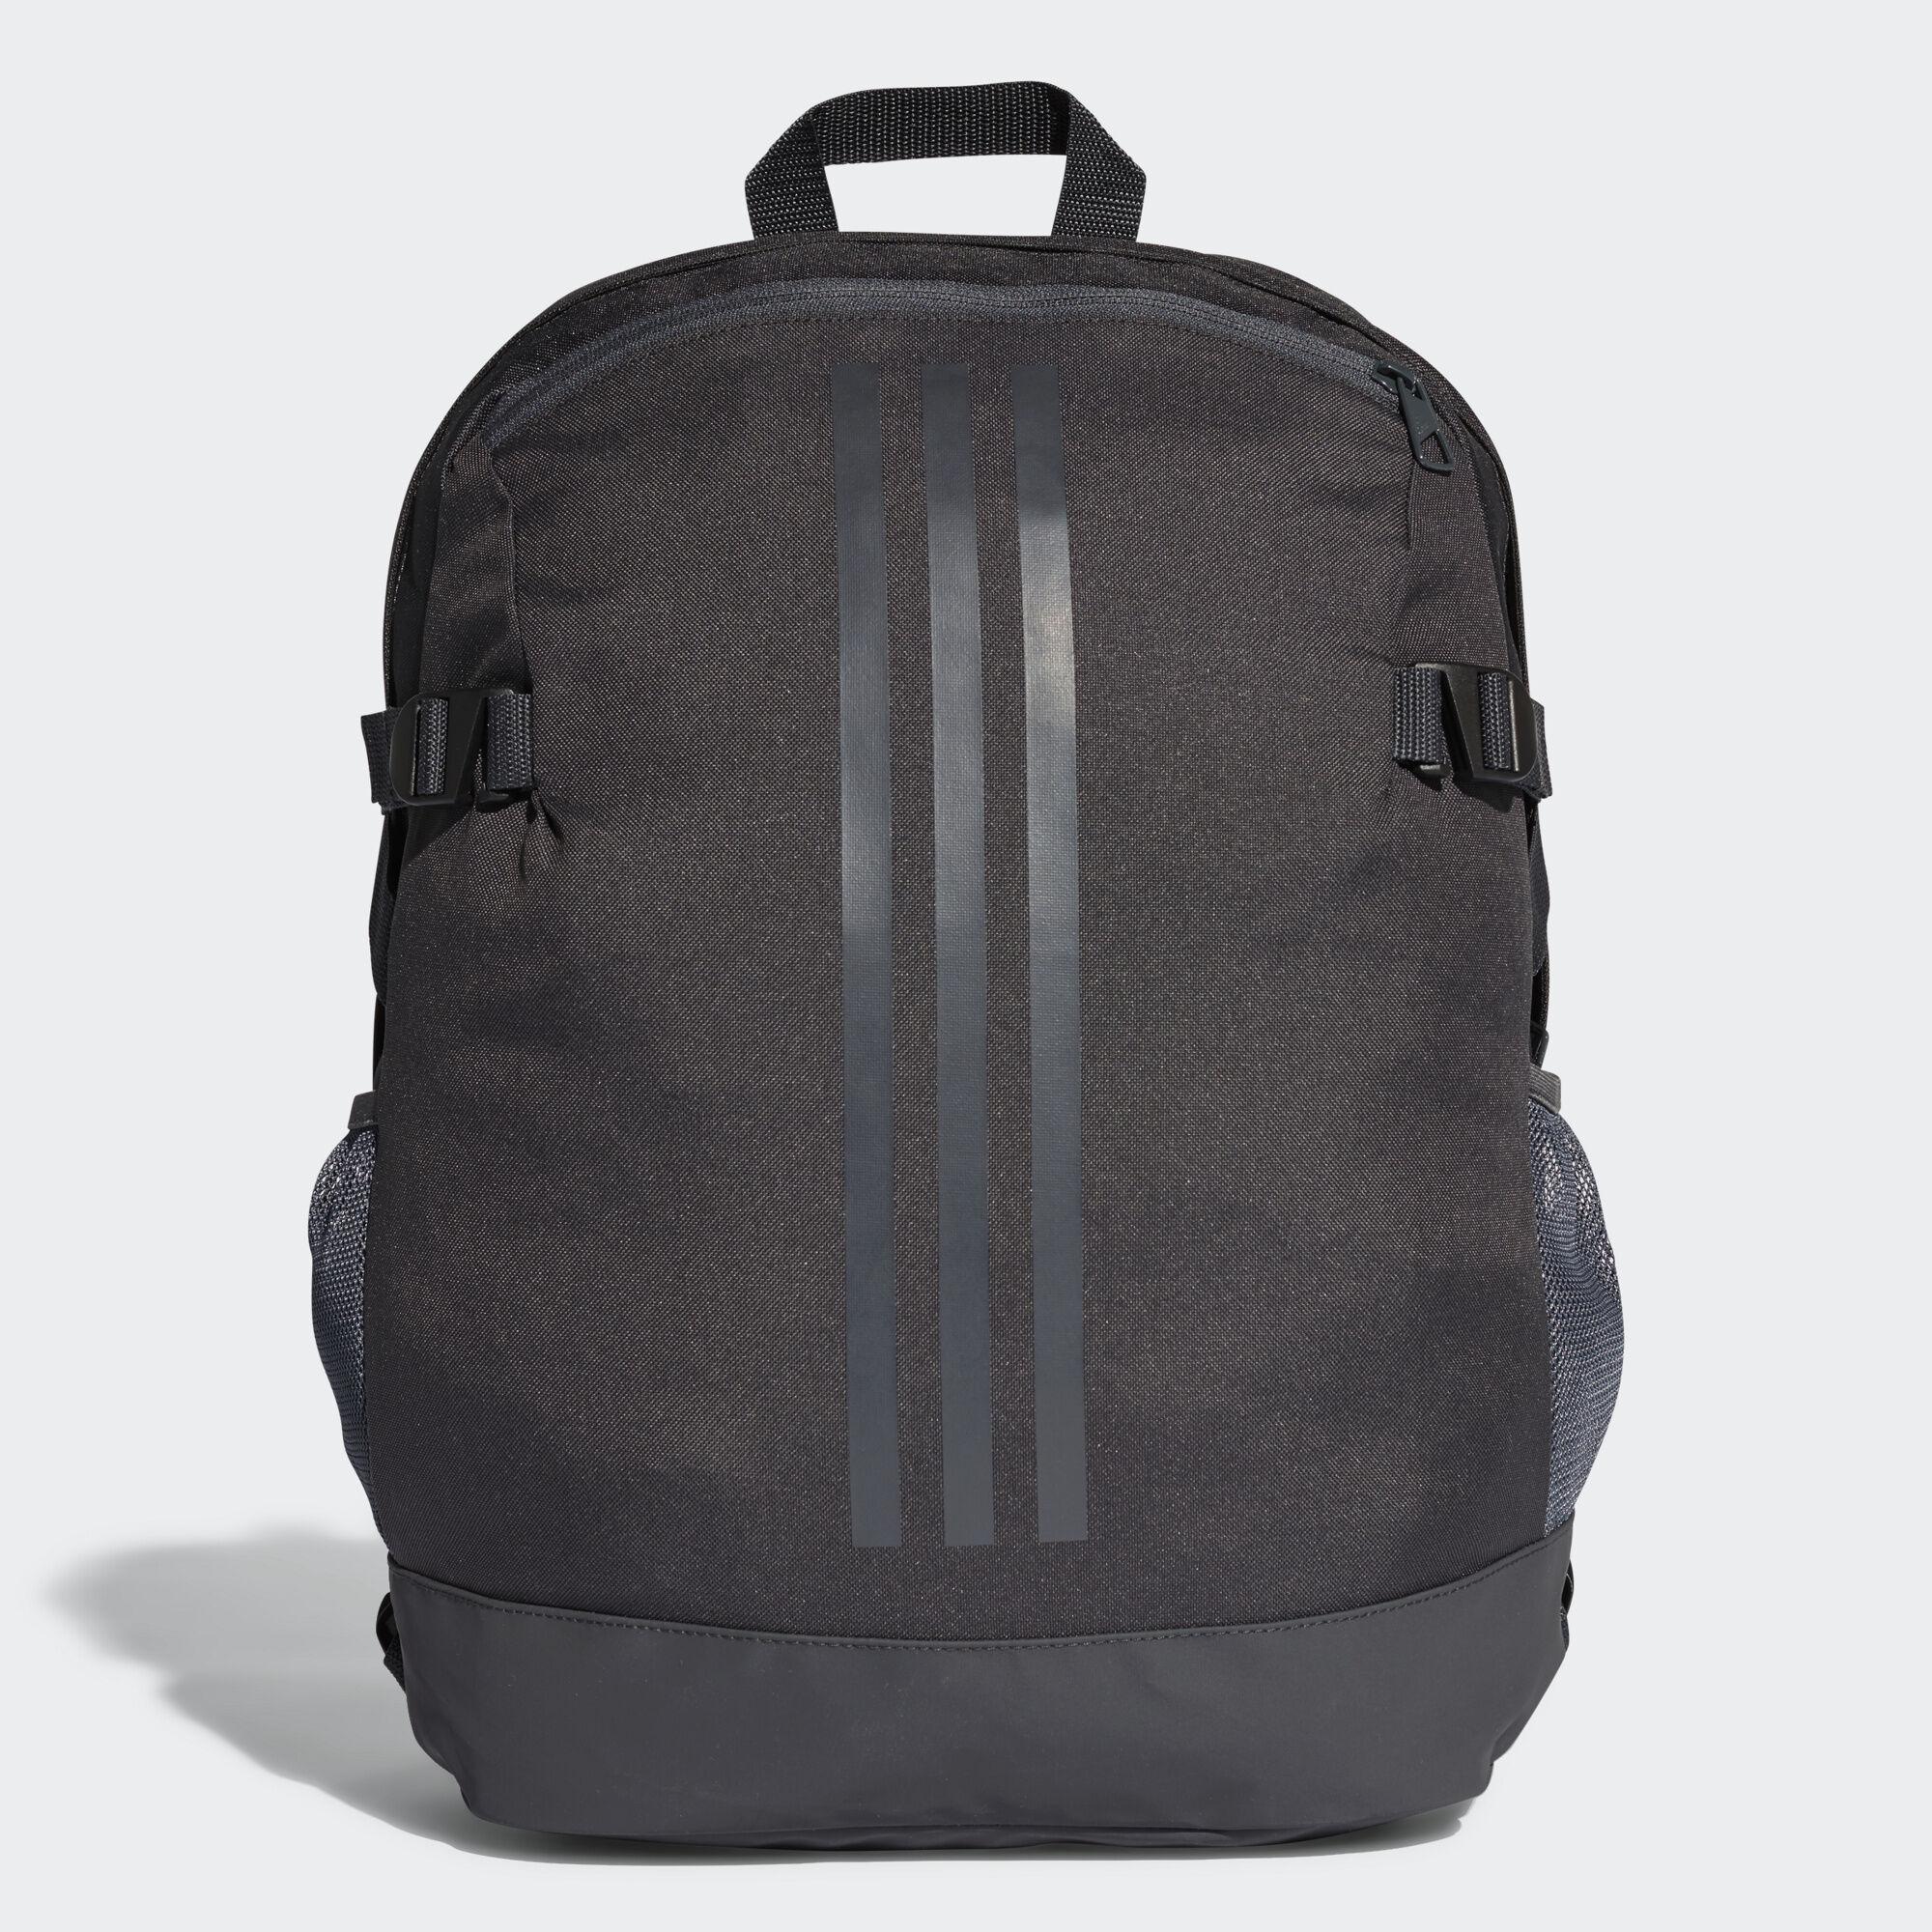 adidas backpack 2014